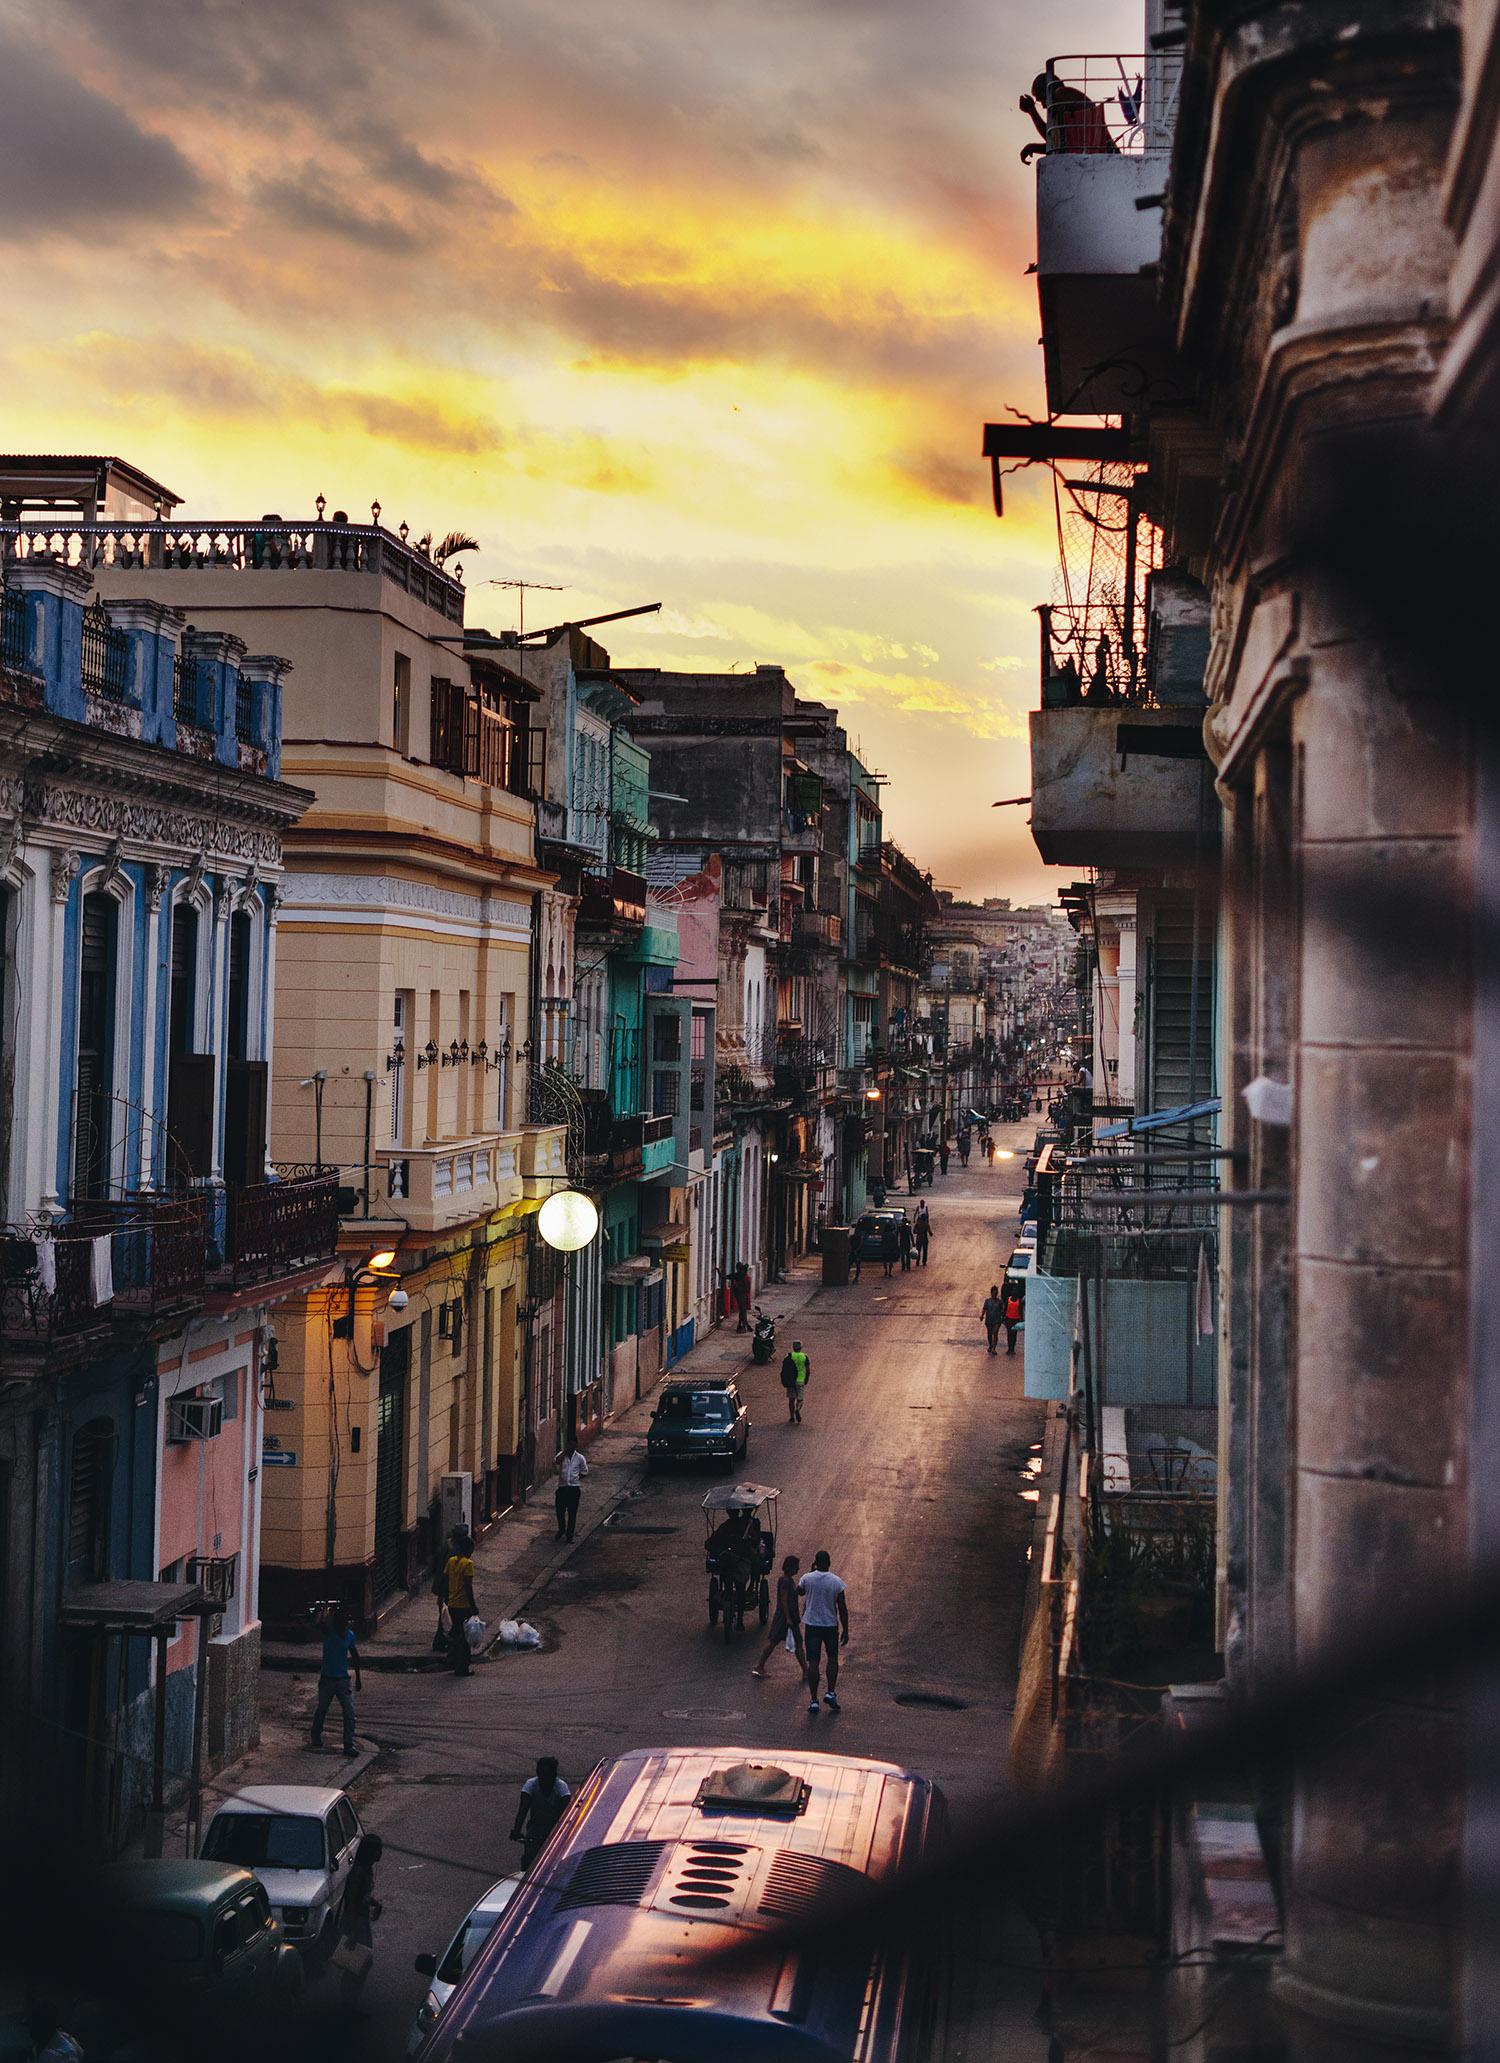 030_Cuba_-7289_V1_final.jpg